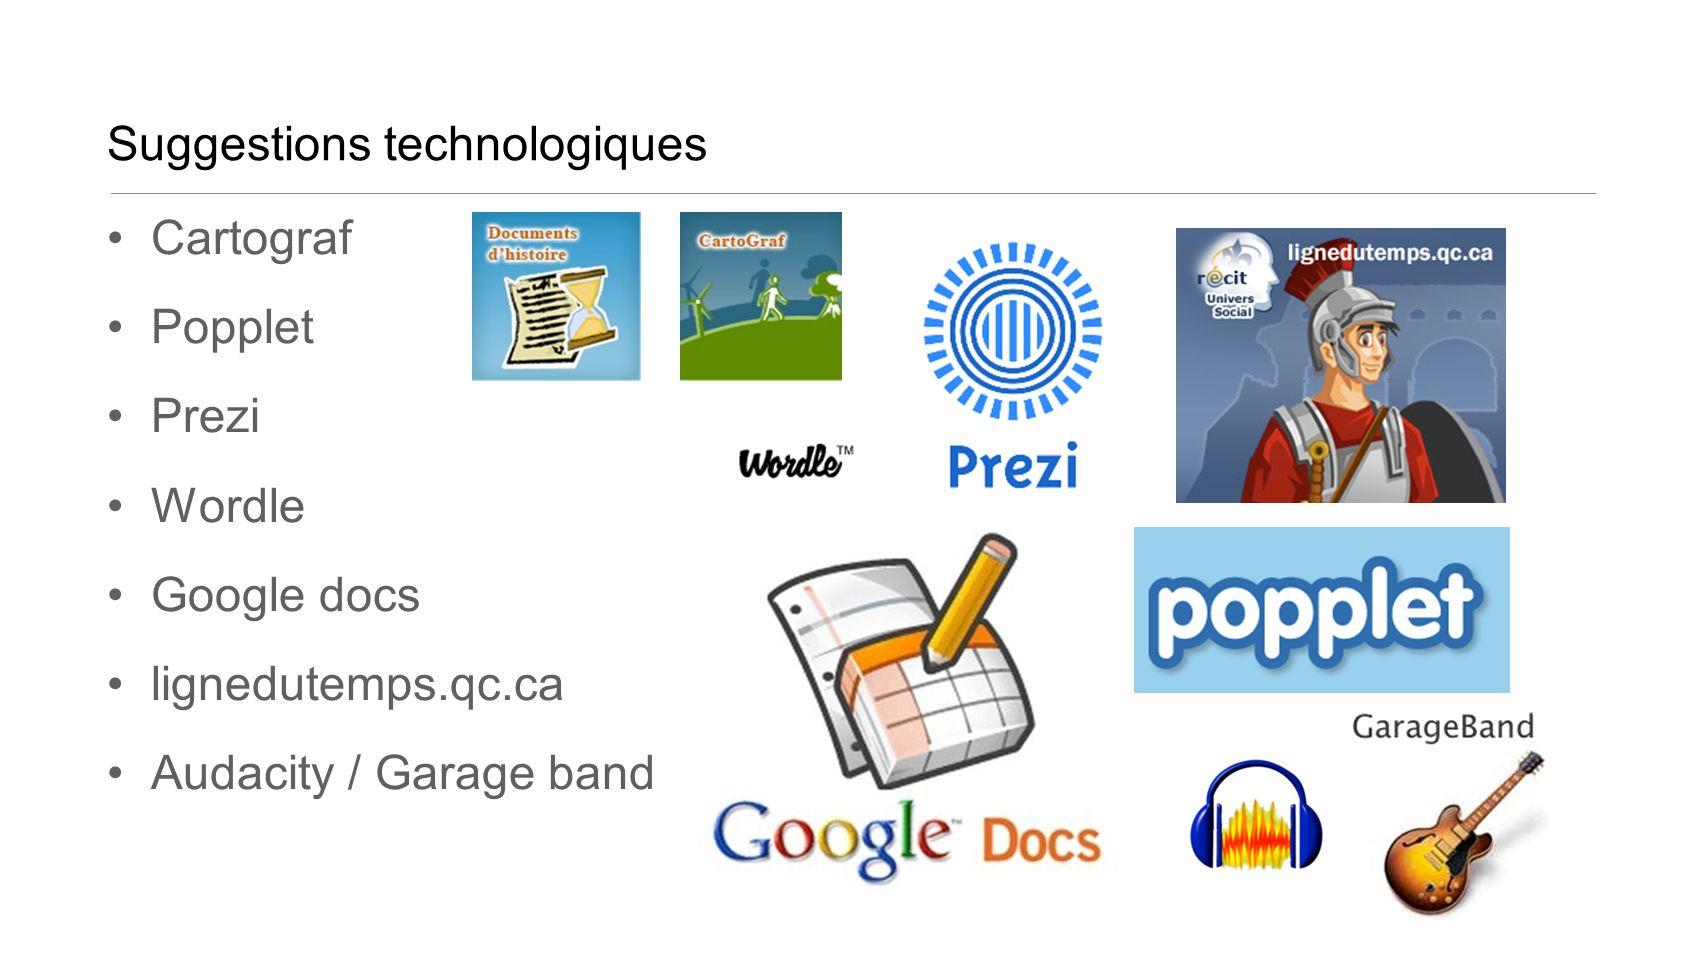 Suggestions technologiques